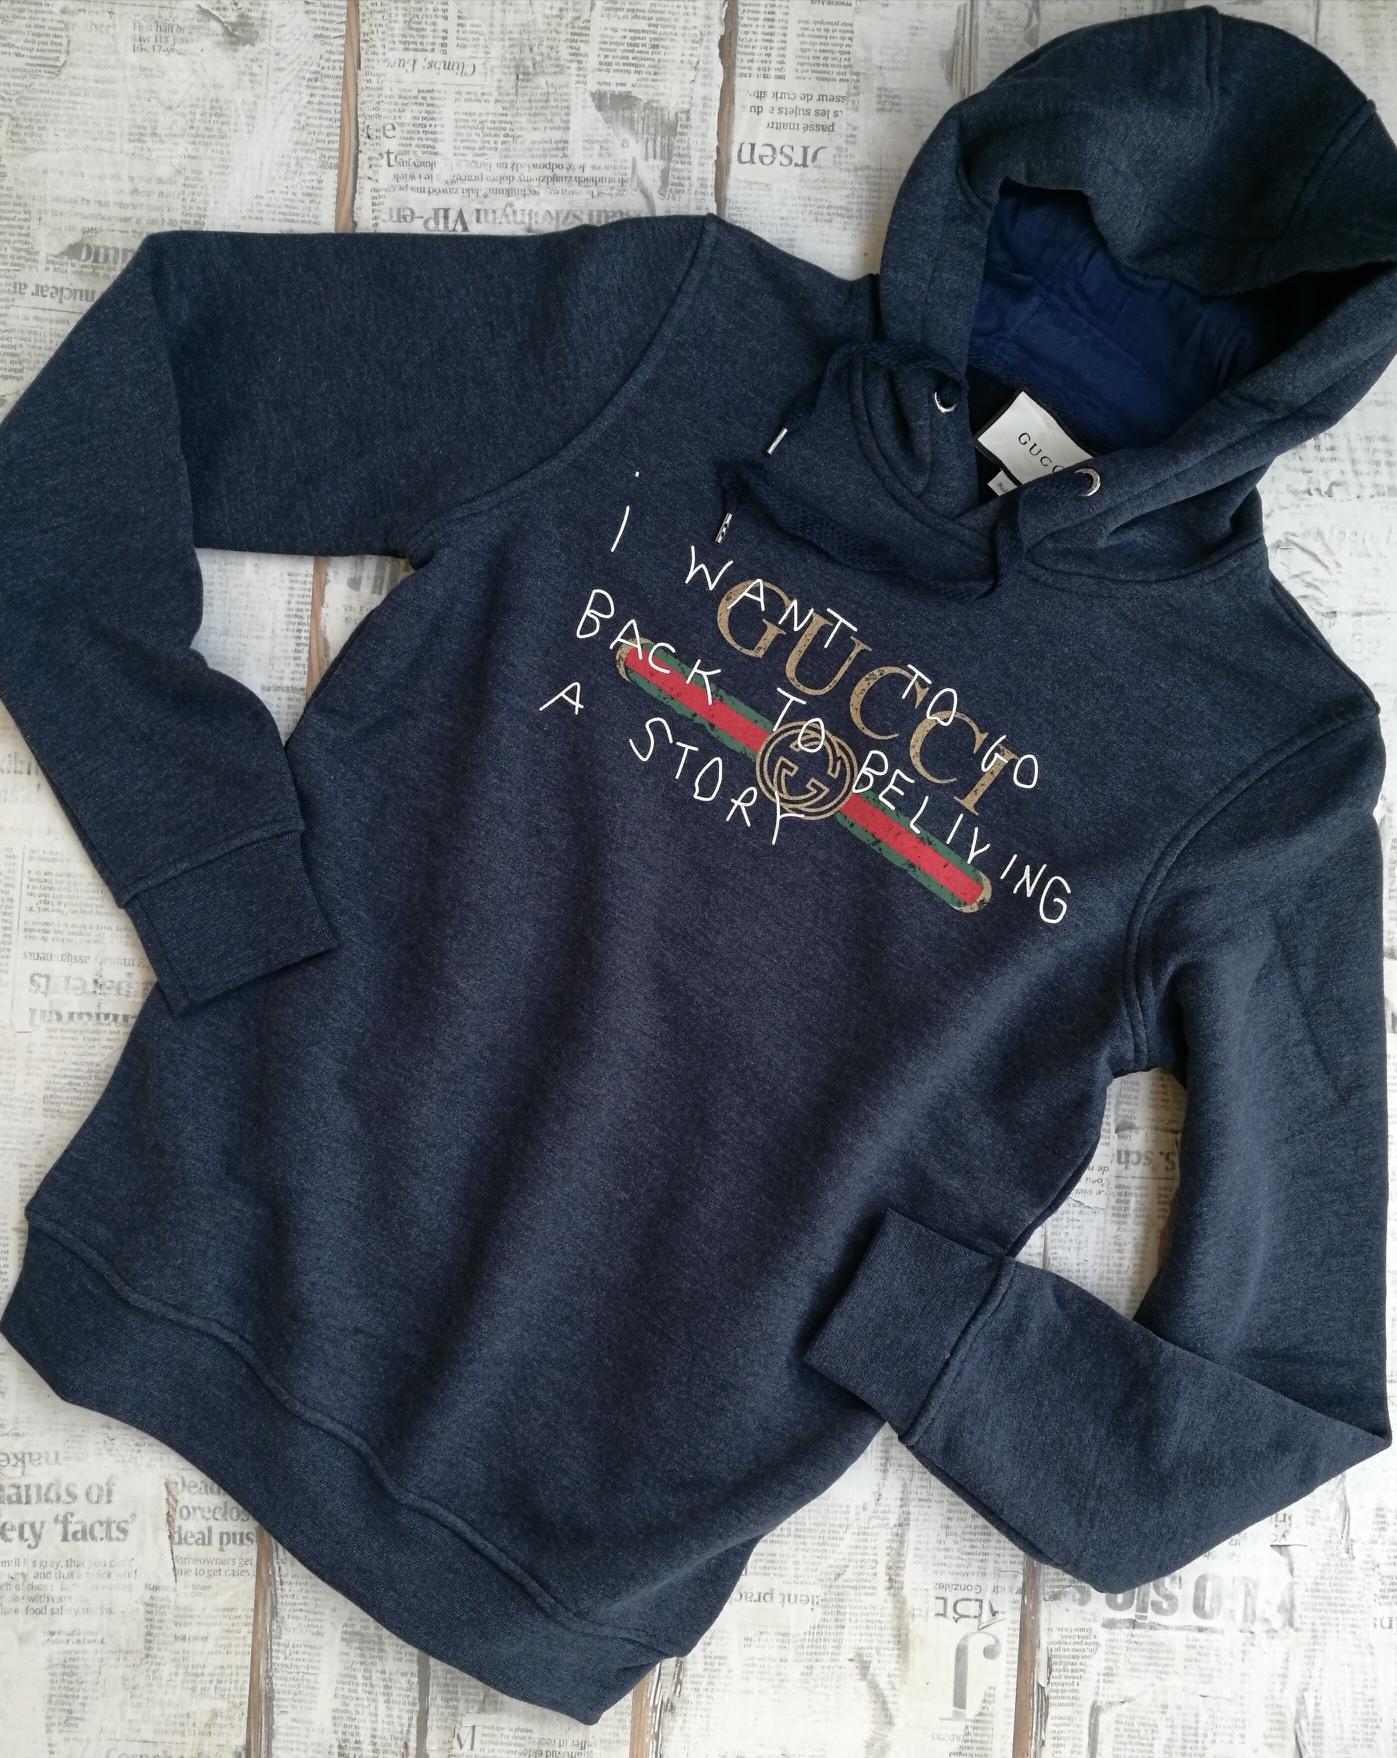 3cde0cdebcf Gucci Men s Hoodie Coco Capitán Logo Sweatshirt on Storenvy